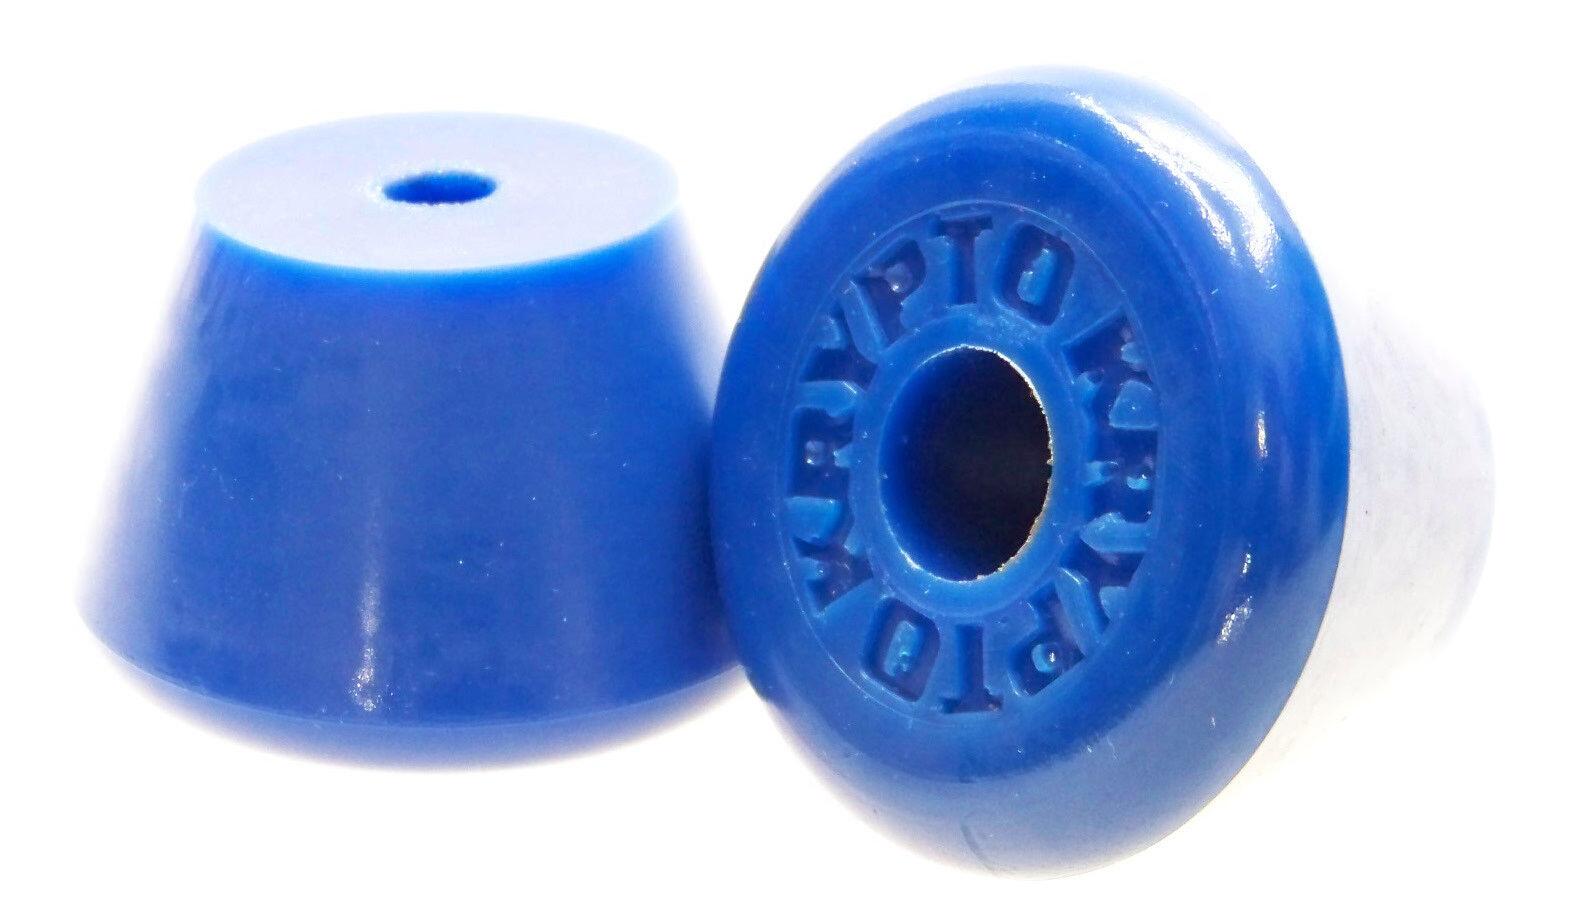 Rollschuh Rollen   Stopper Stopper Stopper   ABEC Lager Set  Disco Roller Skate PANAME Gelb 910bb1